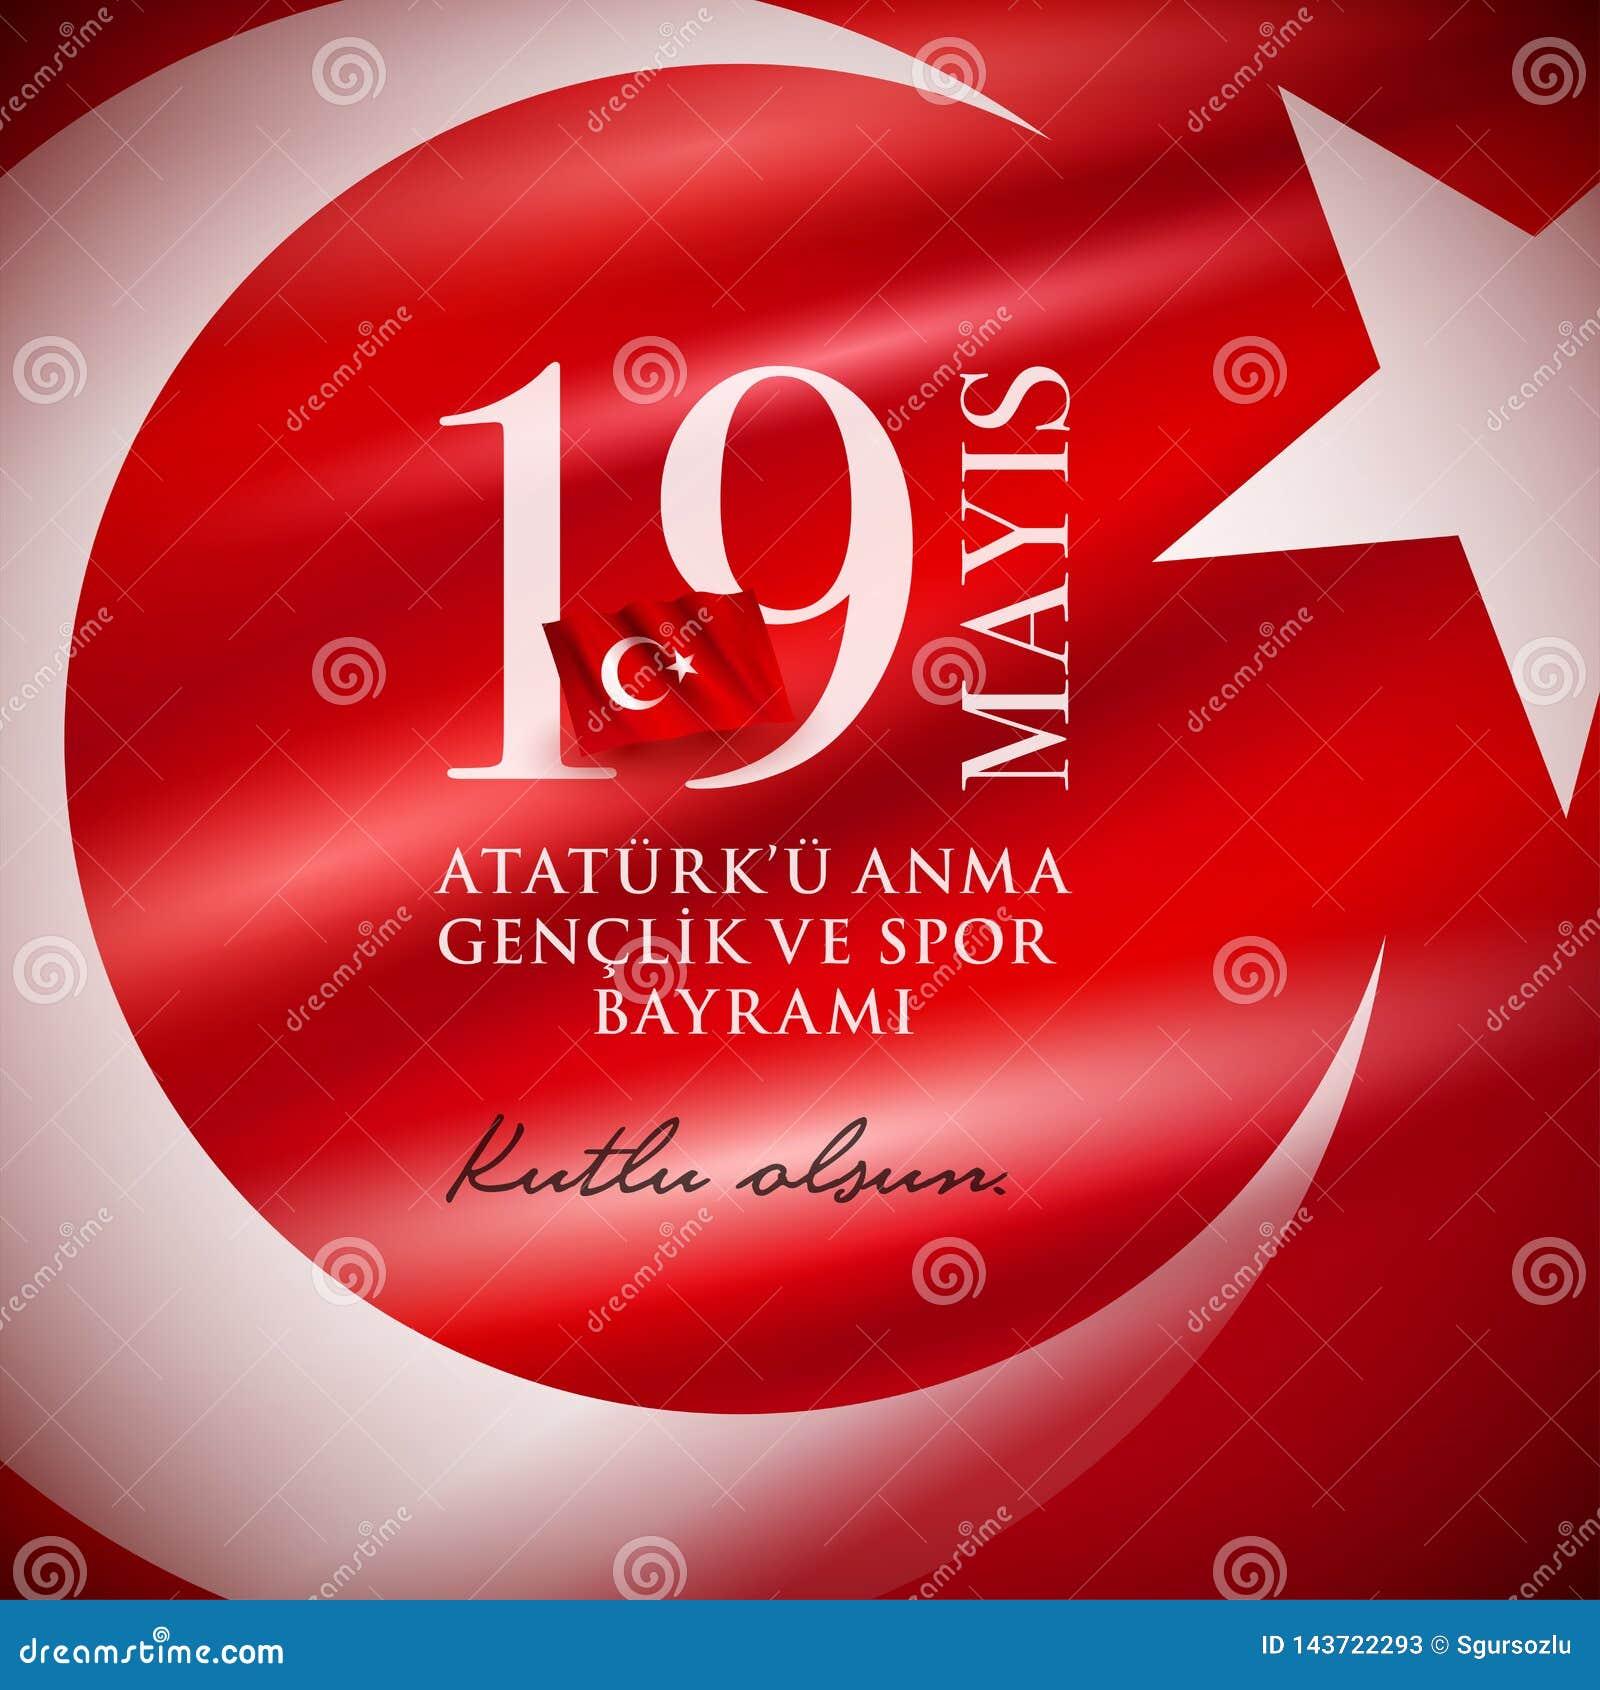 19 mayis Ataturk ` u Anma Genclik ve Spor Bayrami